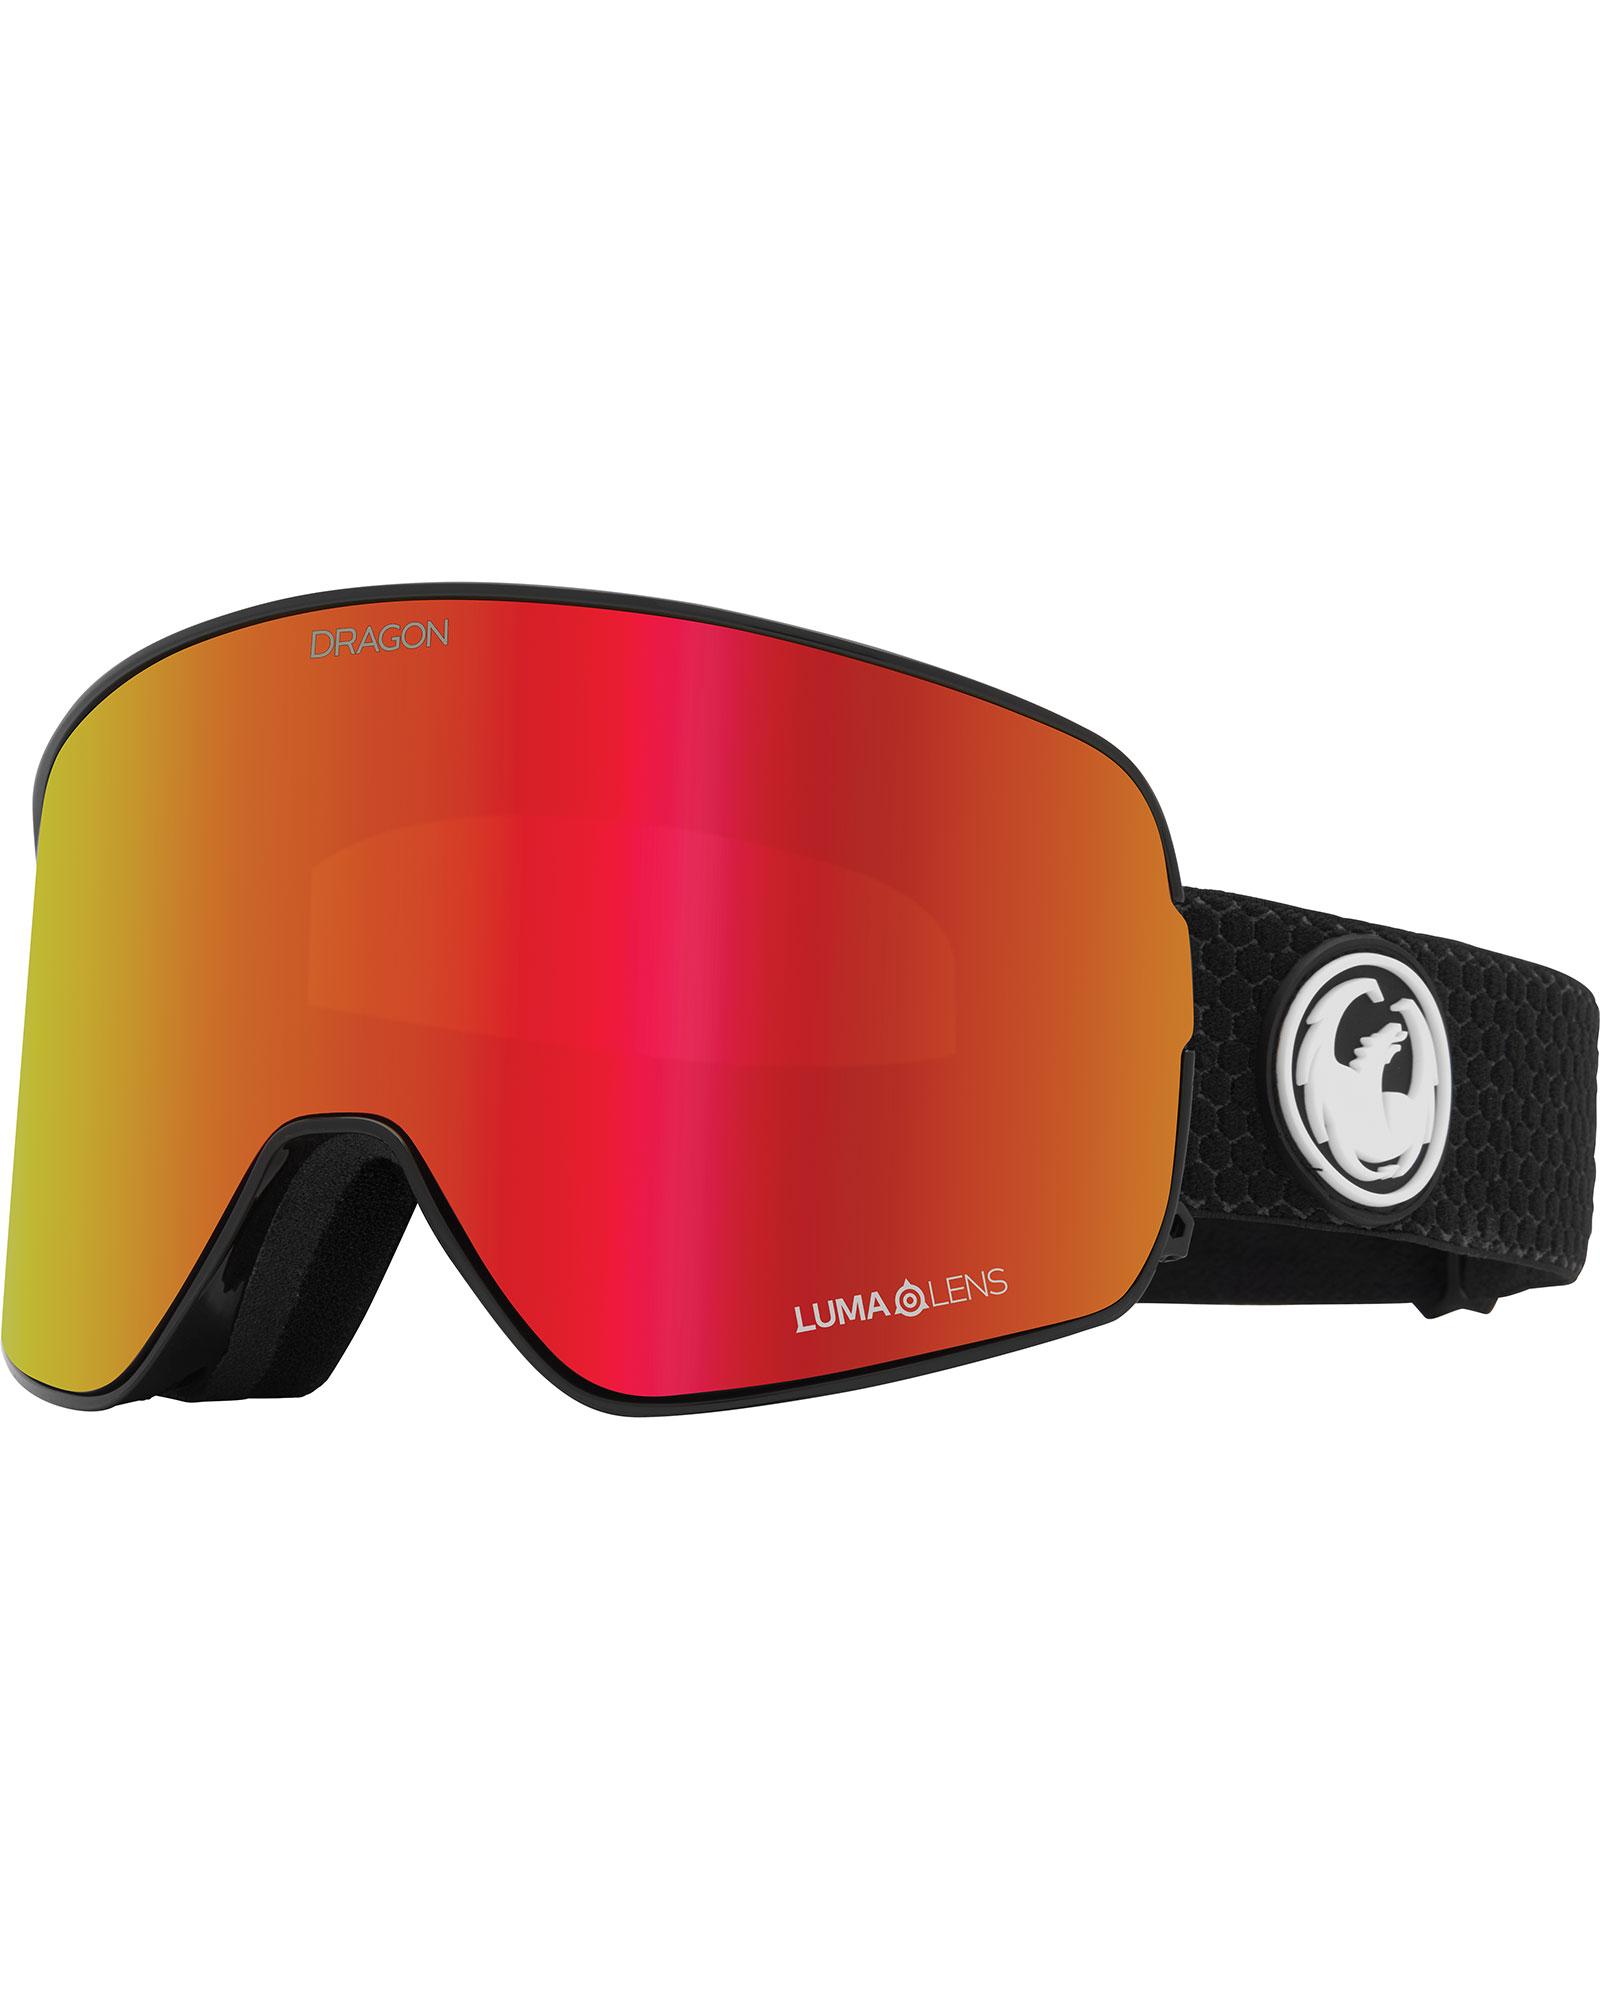 Dragon NFX2 Split / Lumalens Red Ionized + Lumalens Light Rose Goggles 2020 / 2021 0